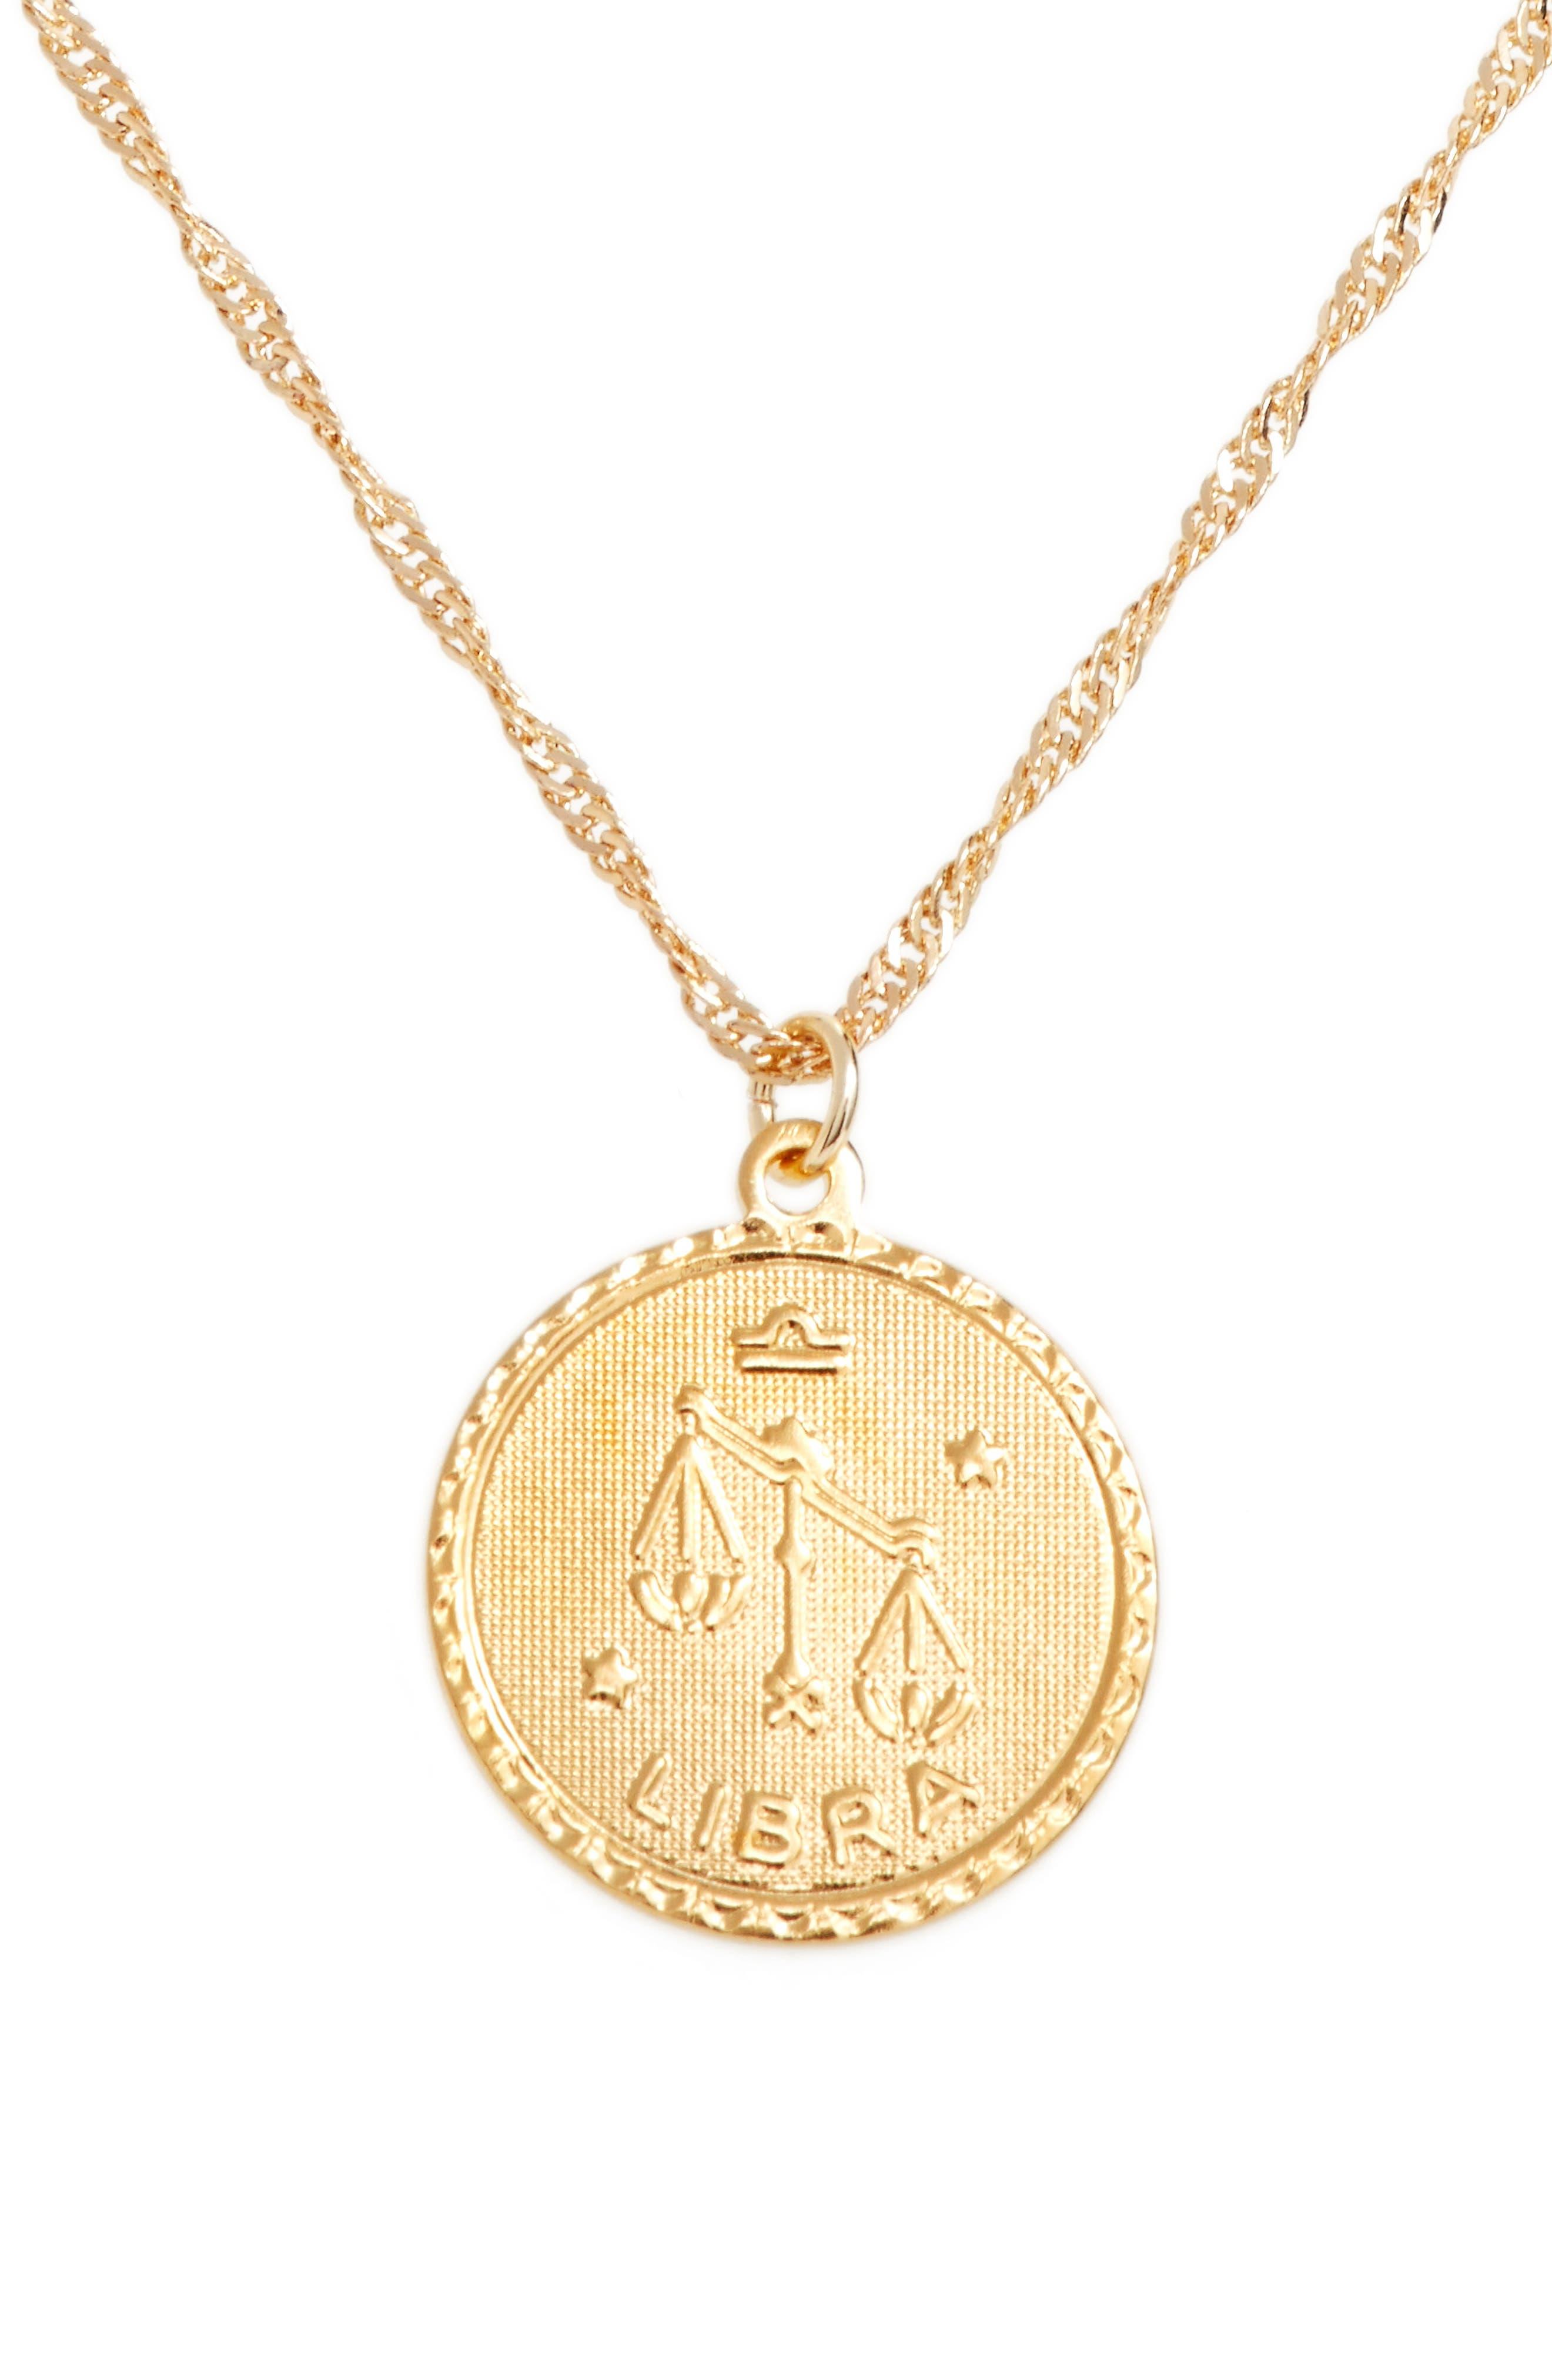 Ascending Libra Pendant Necklace,                             Main thumbnail 1, color,                             Yellow Gold